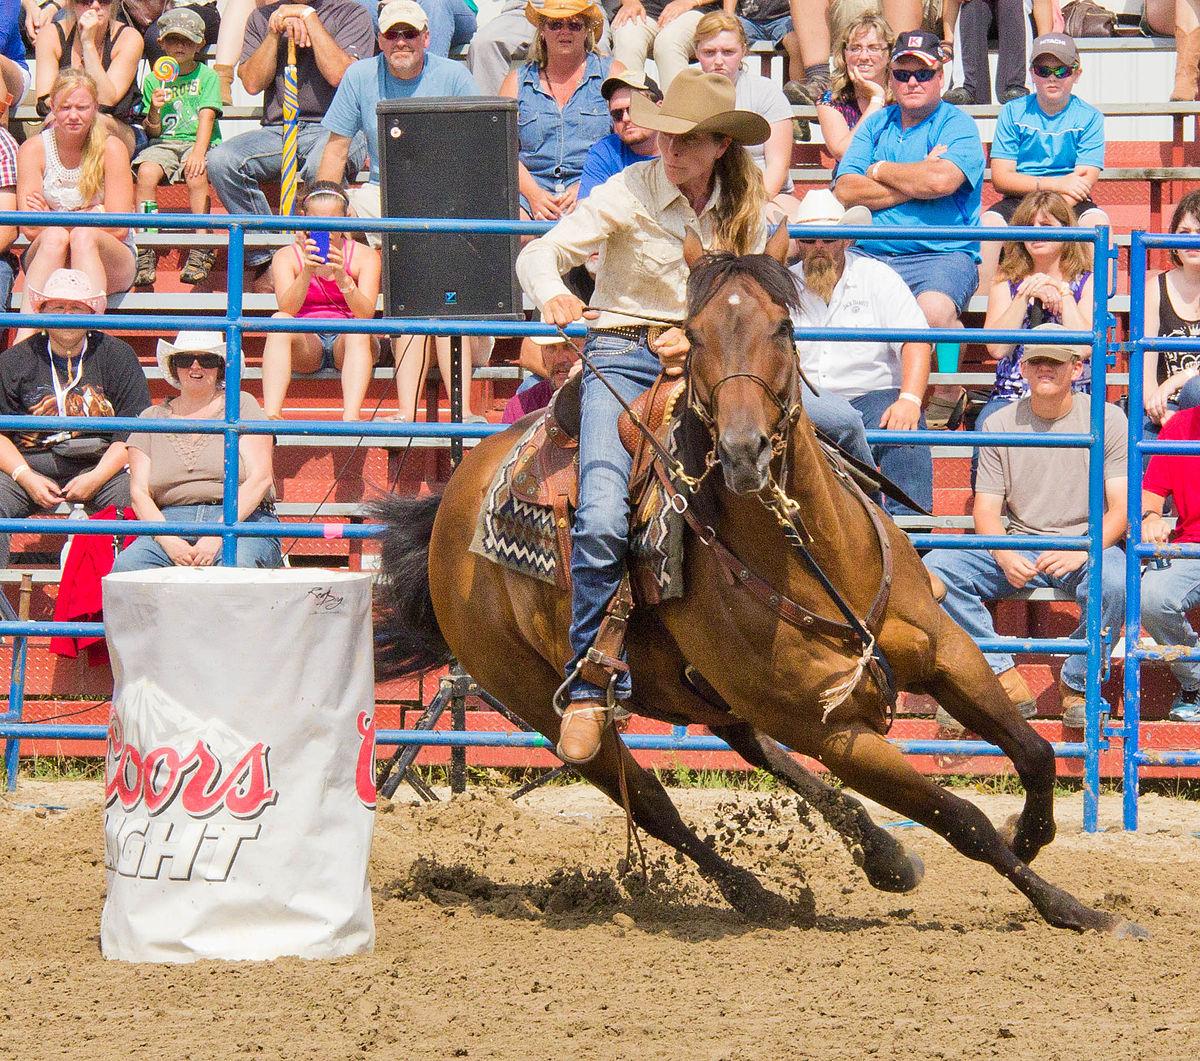 wallpaper girls rodeo sign - photo #15